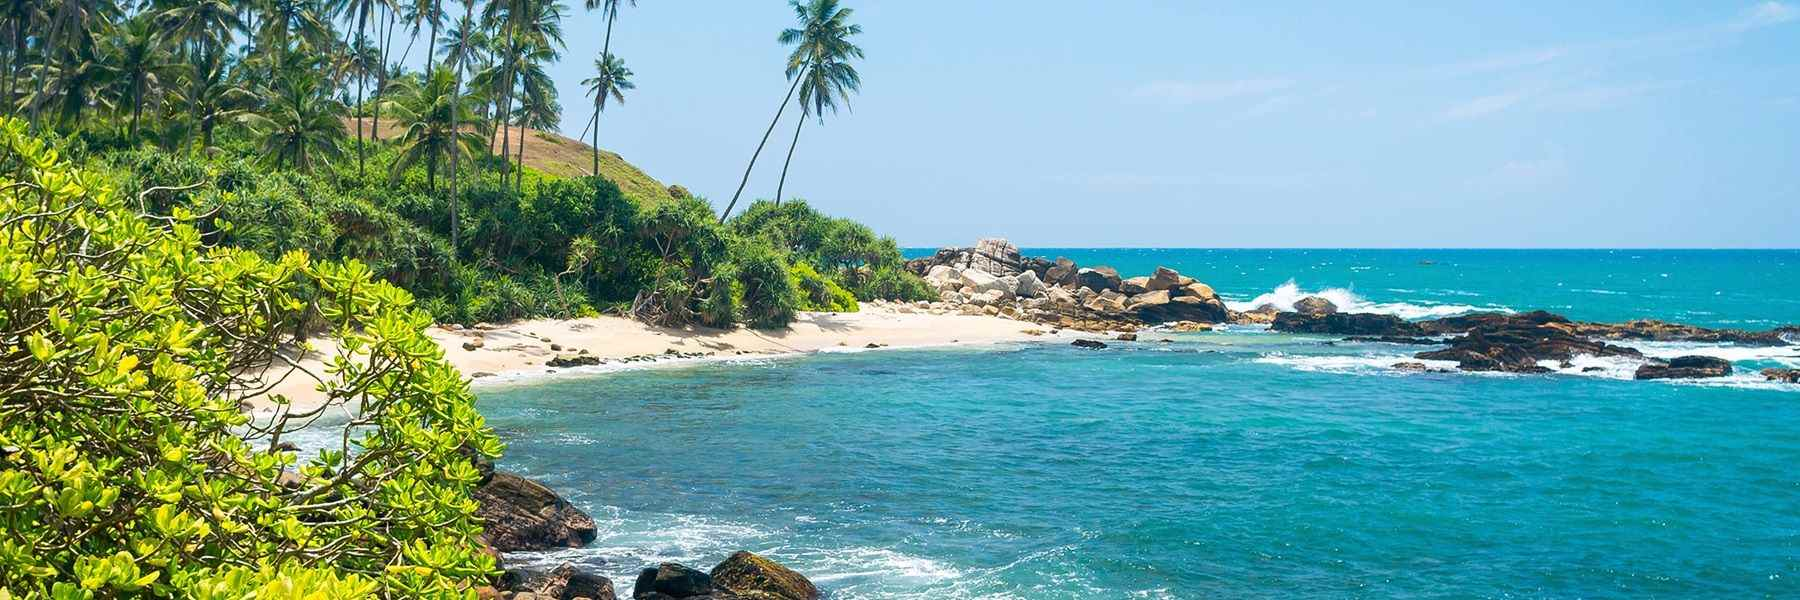 Full Week Holiday in Sri Lanka